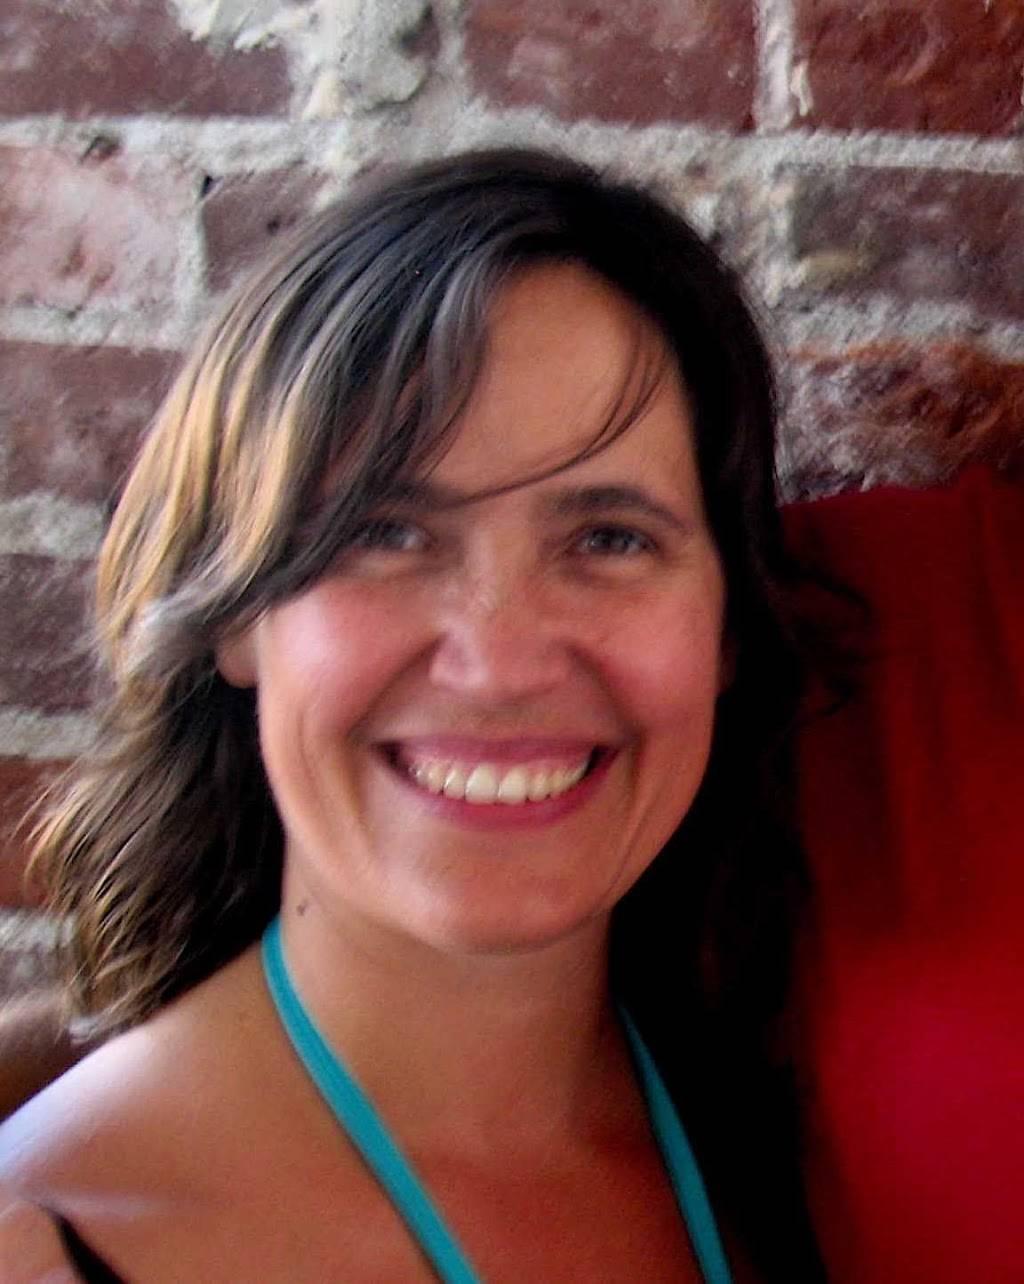 Yoga with Alison Alstrom - school  | Photo 2 of 2 | Address: 3016 NE Killingsworth St, Portland, OR 97213, USA | Phone: (415) 587-8228